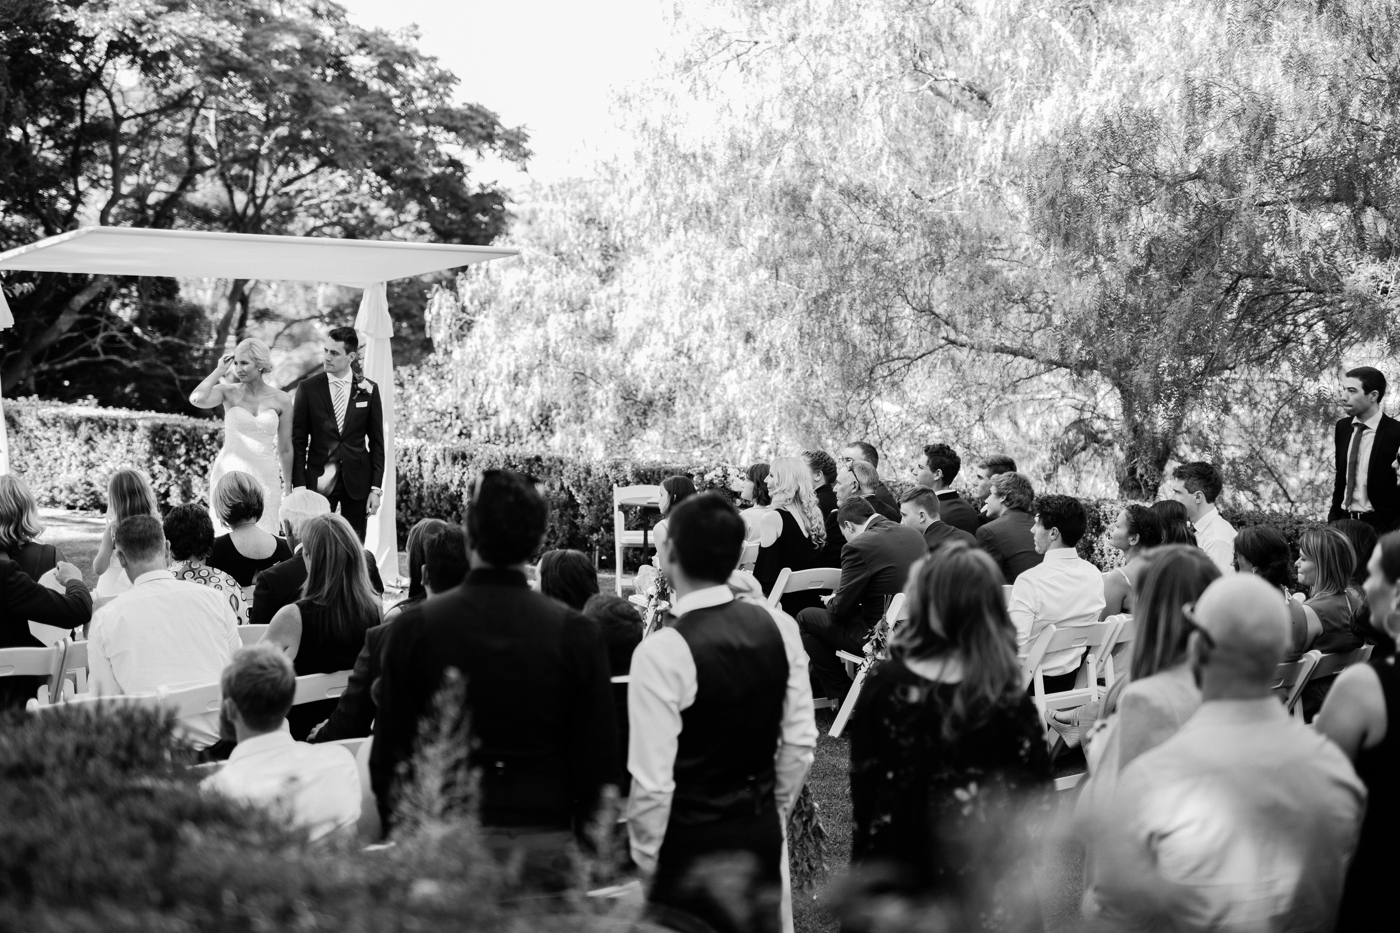 Lauren & Max - Marybank Estate Wedding - Natural wedding photographer in Adelaide - www.katherineschultzphotography.com 71